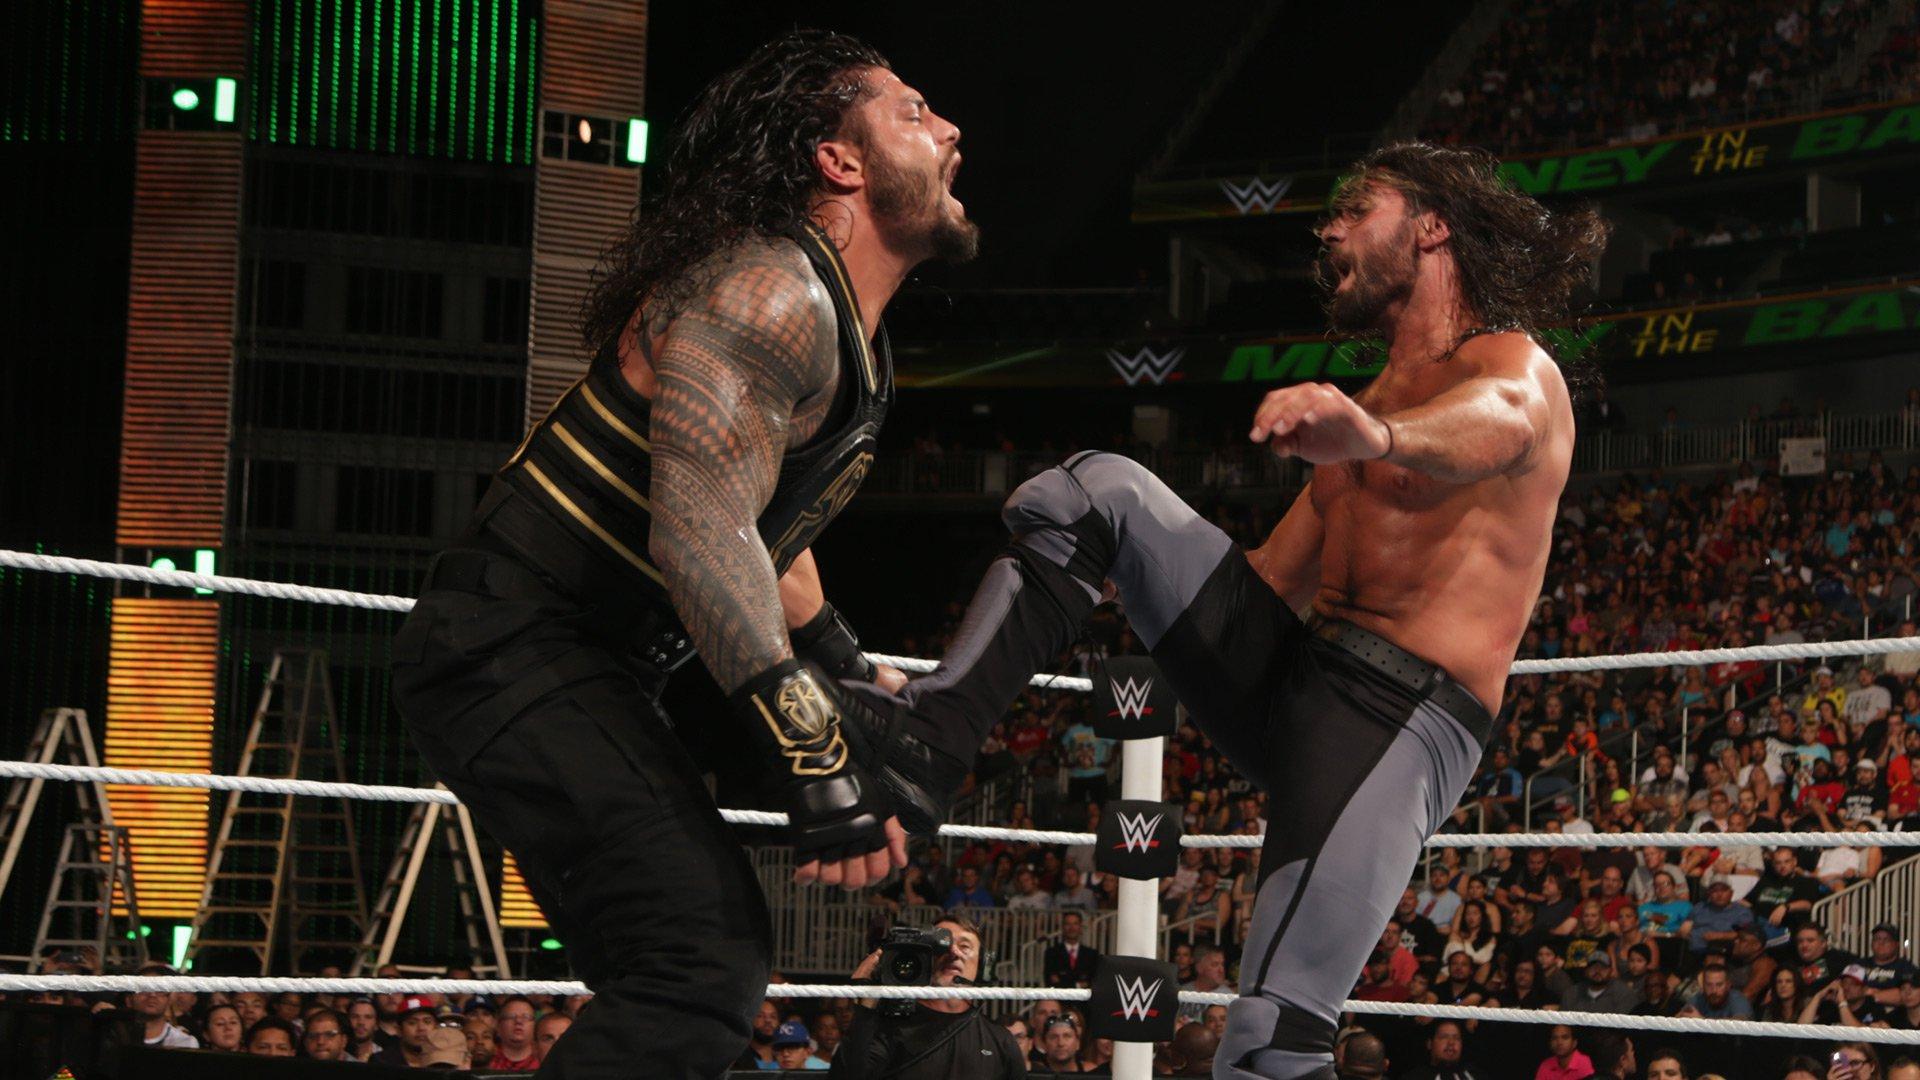 WWE Network: Roman Reigns vs. Seth Rollins - Match de Championnat du Monde Poids-Lourds de la WWE: WWE Money in the Bank 2016